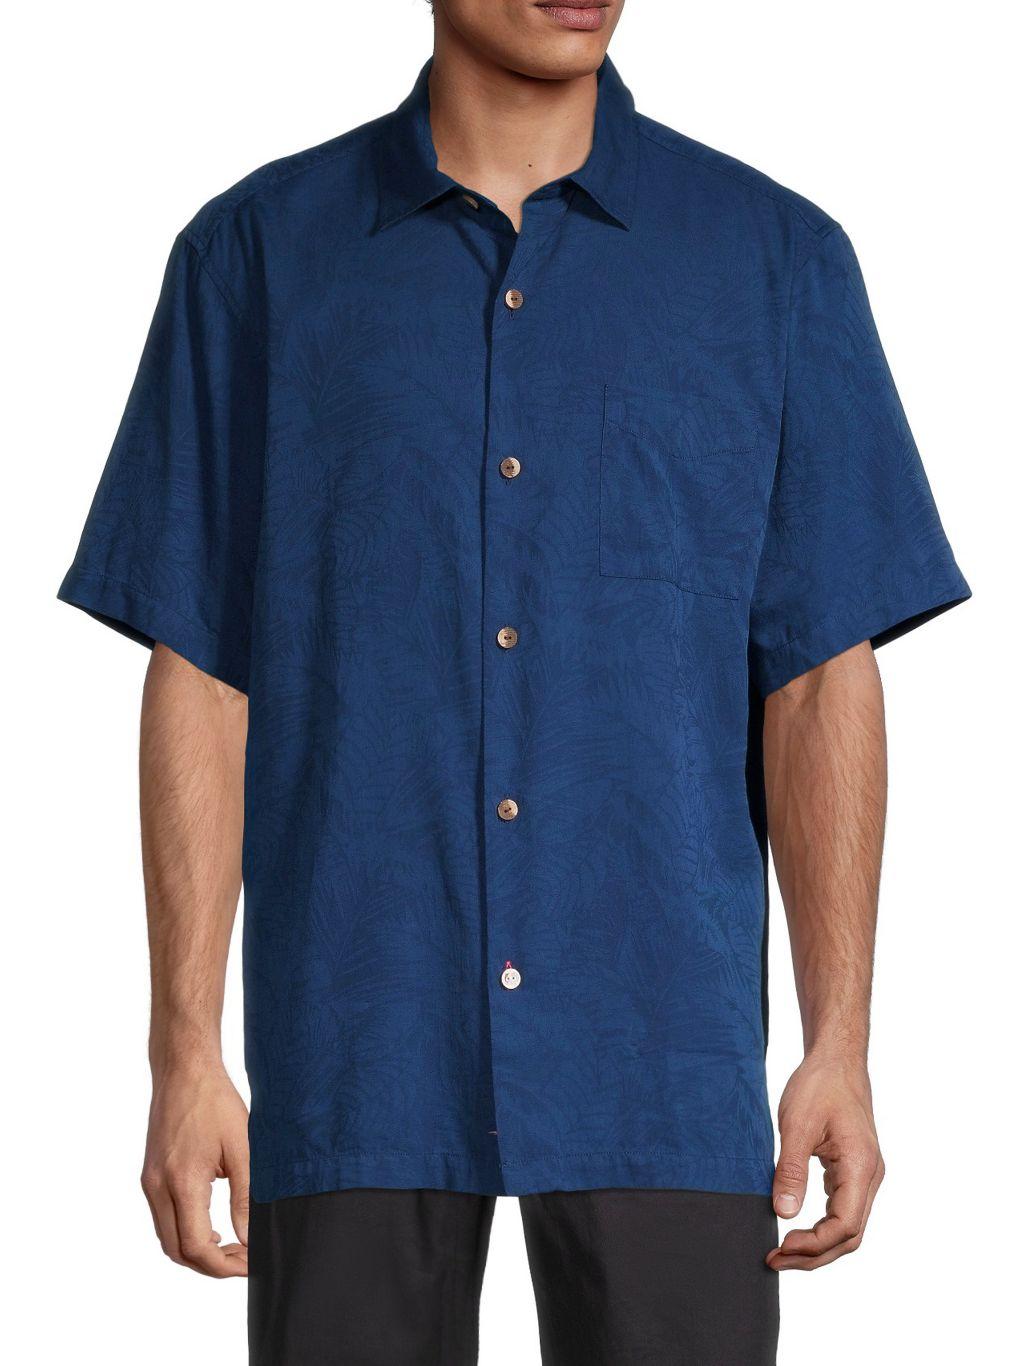 Tommy Bahama Camden Coast Jacquard Palm Leaf Linen-Blend Short-Sleeve Shirt